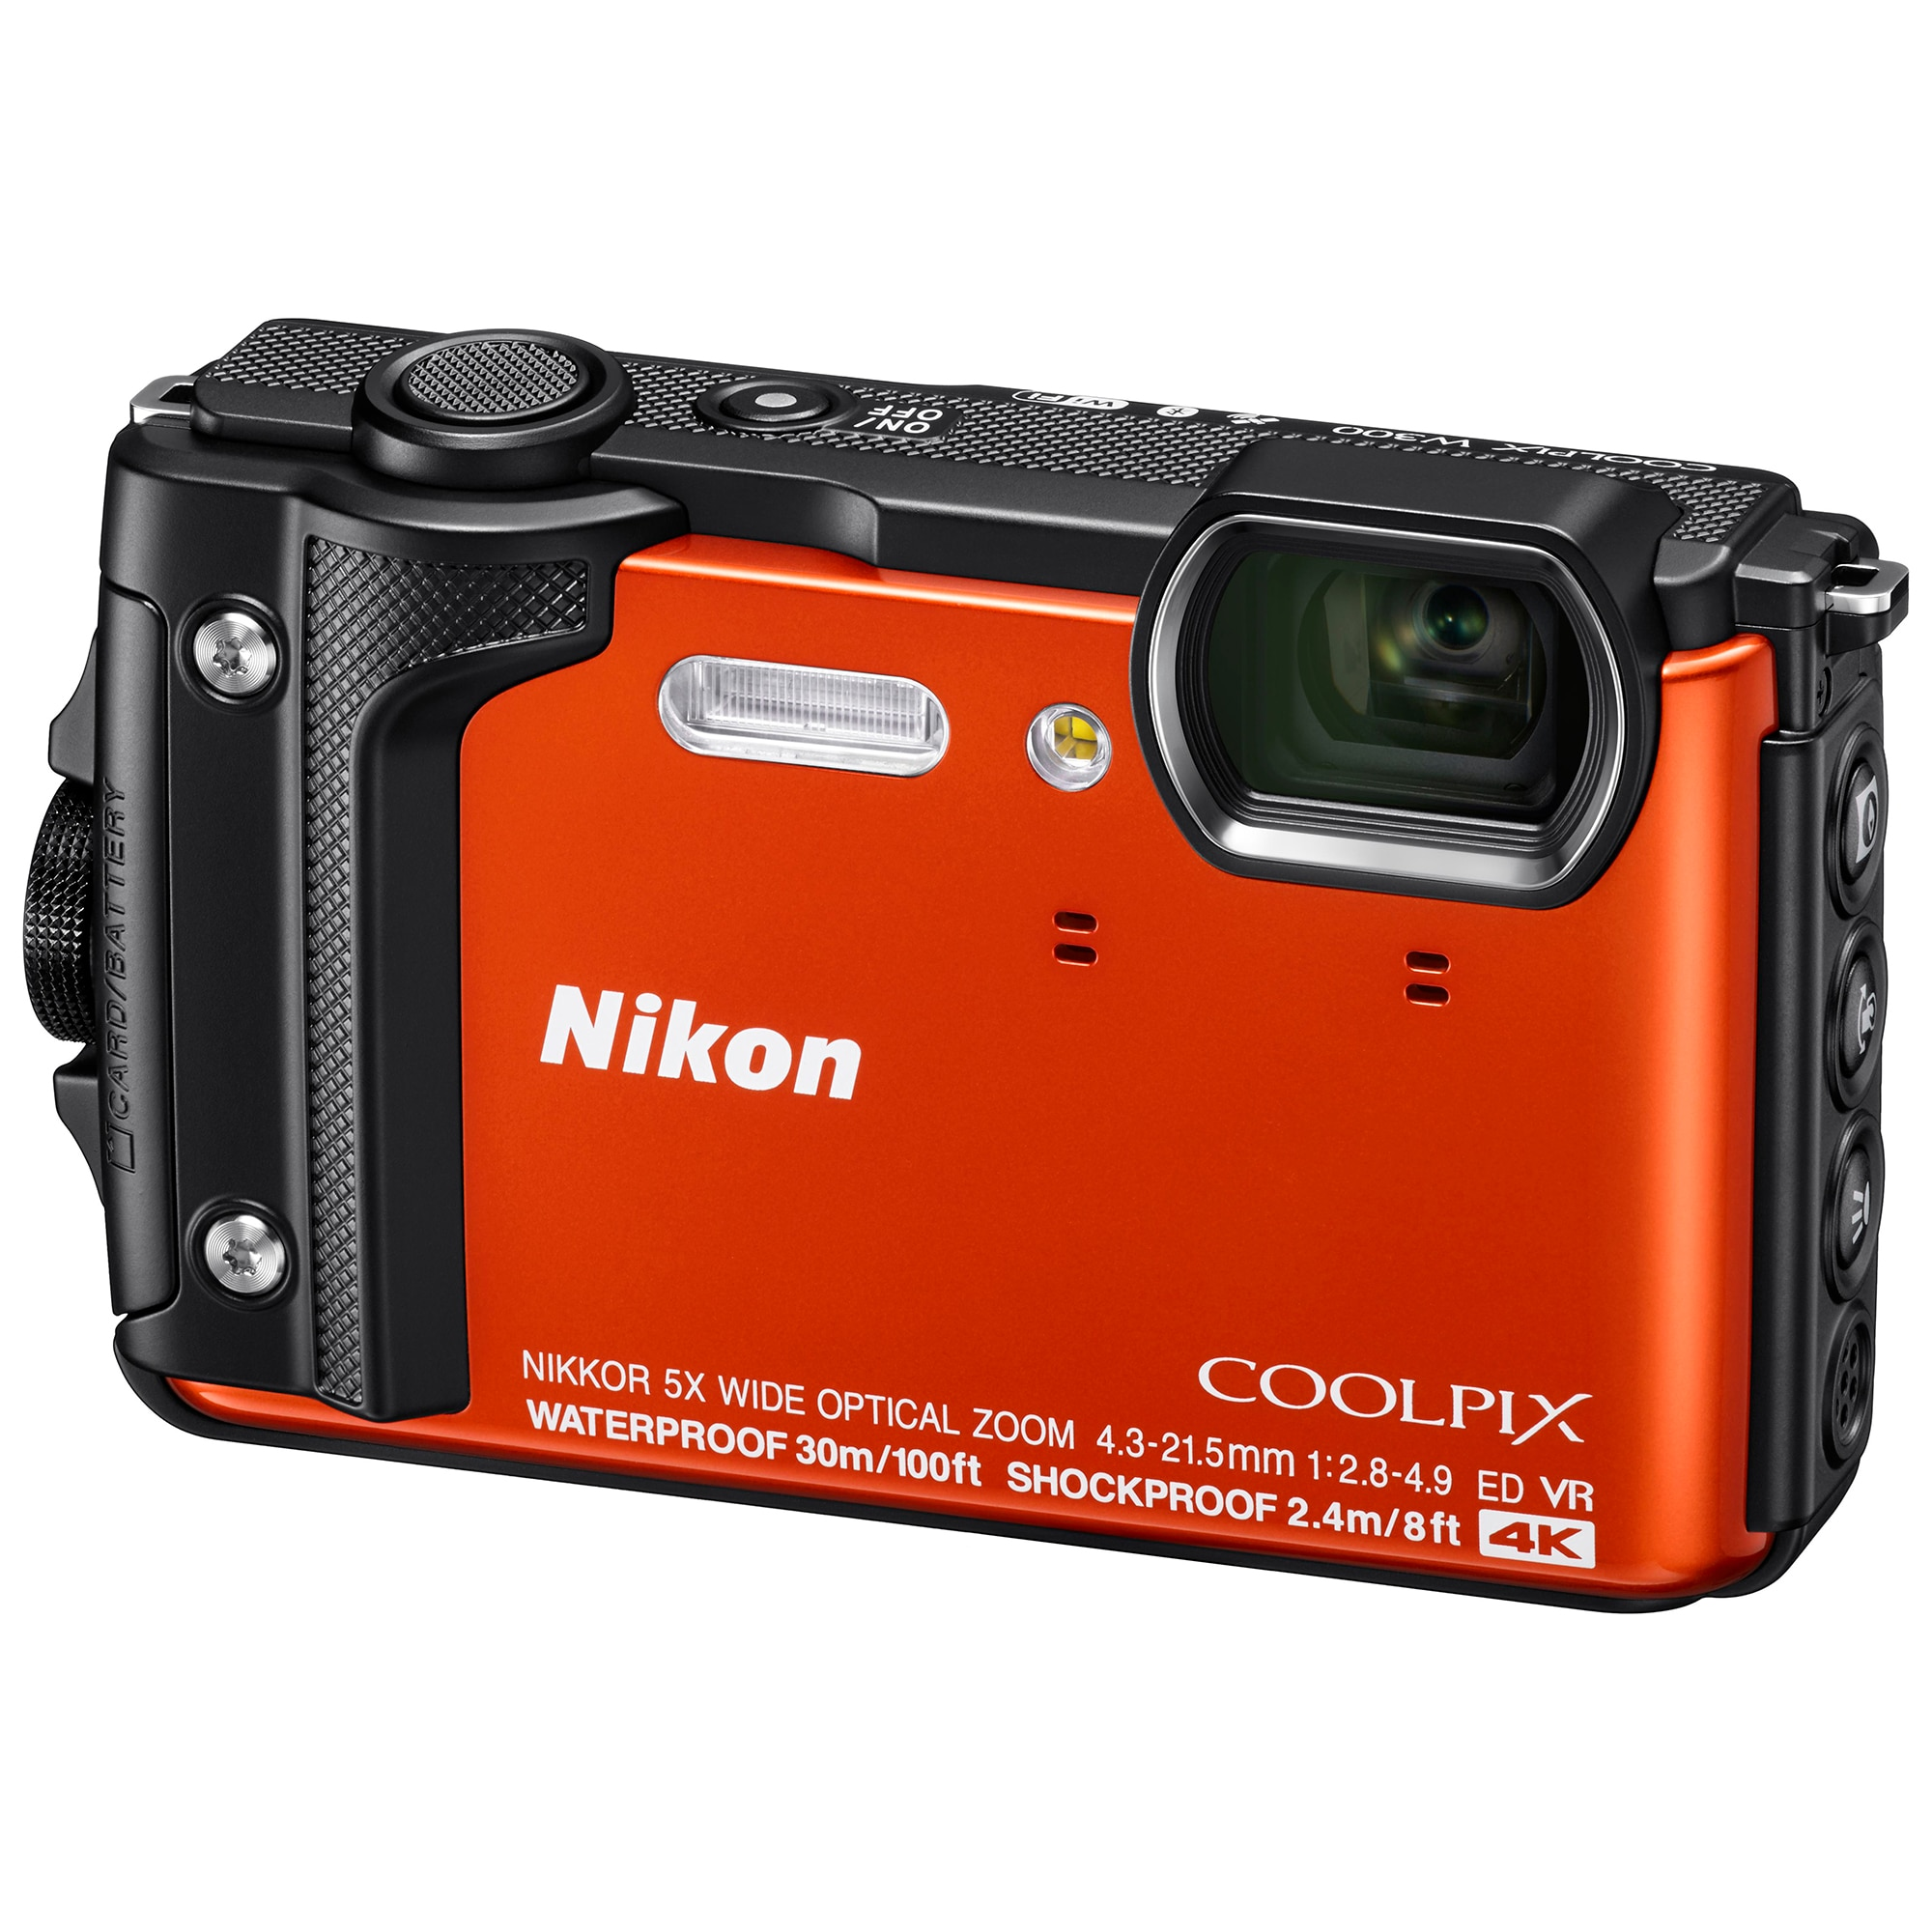 Fotografie Aparat foto digital Nikon COOLPIX W300 Holiday Kit, Portocaliu